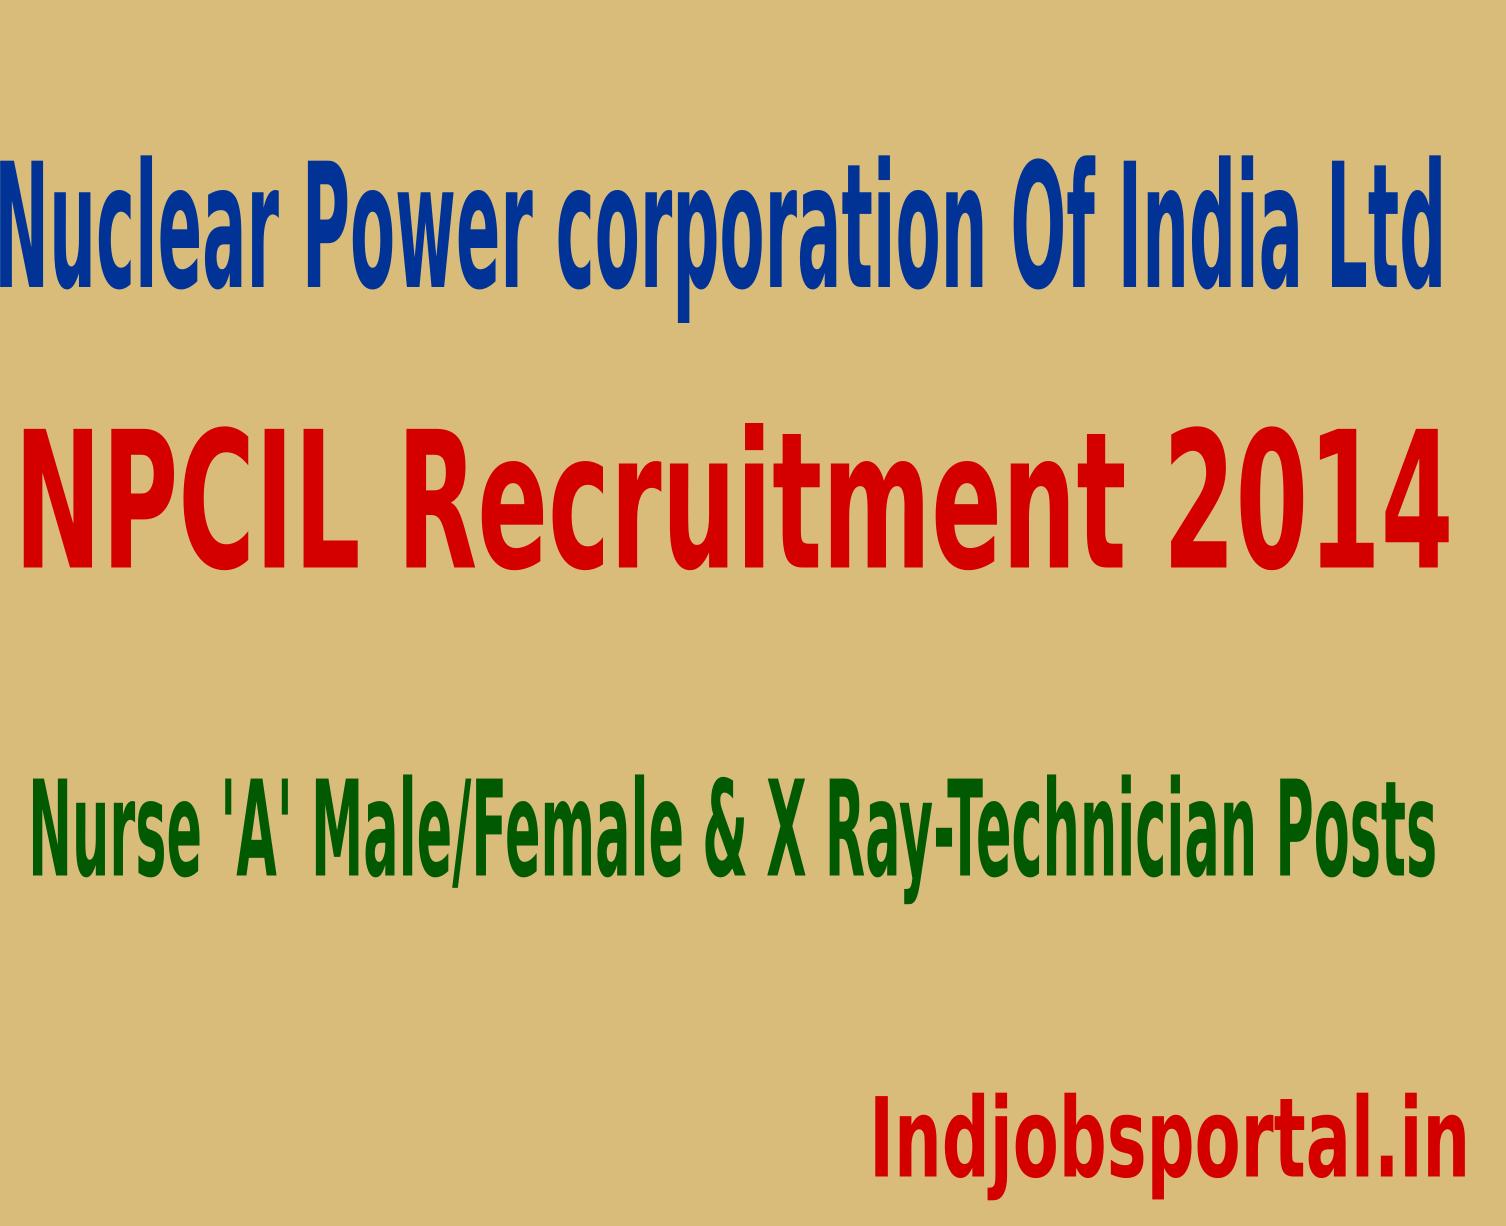 NPCIL Recruitment 2014 For Nurse 'A' Male,Female & X Ray-Technician Posts